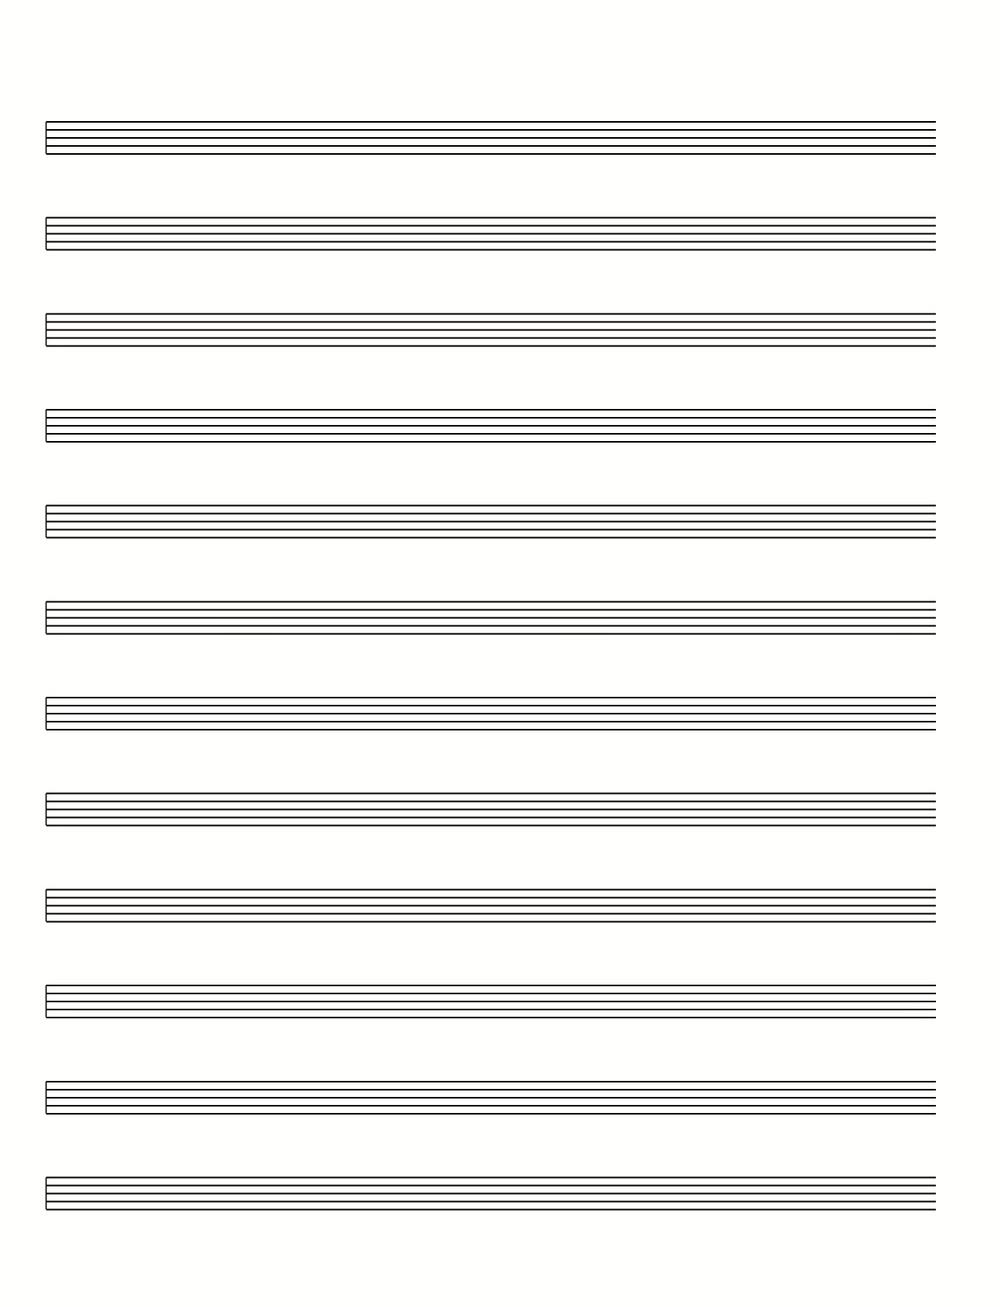 blank guitar music sheet word document